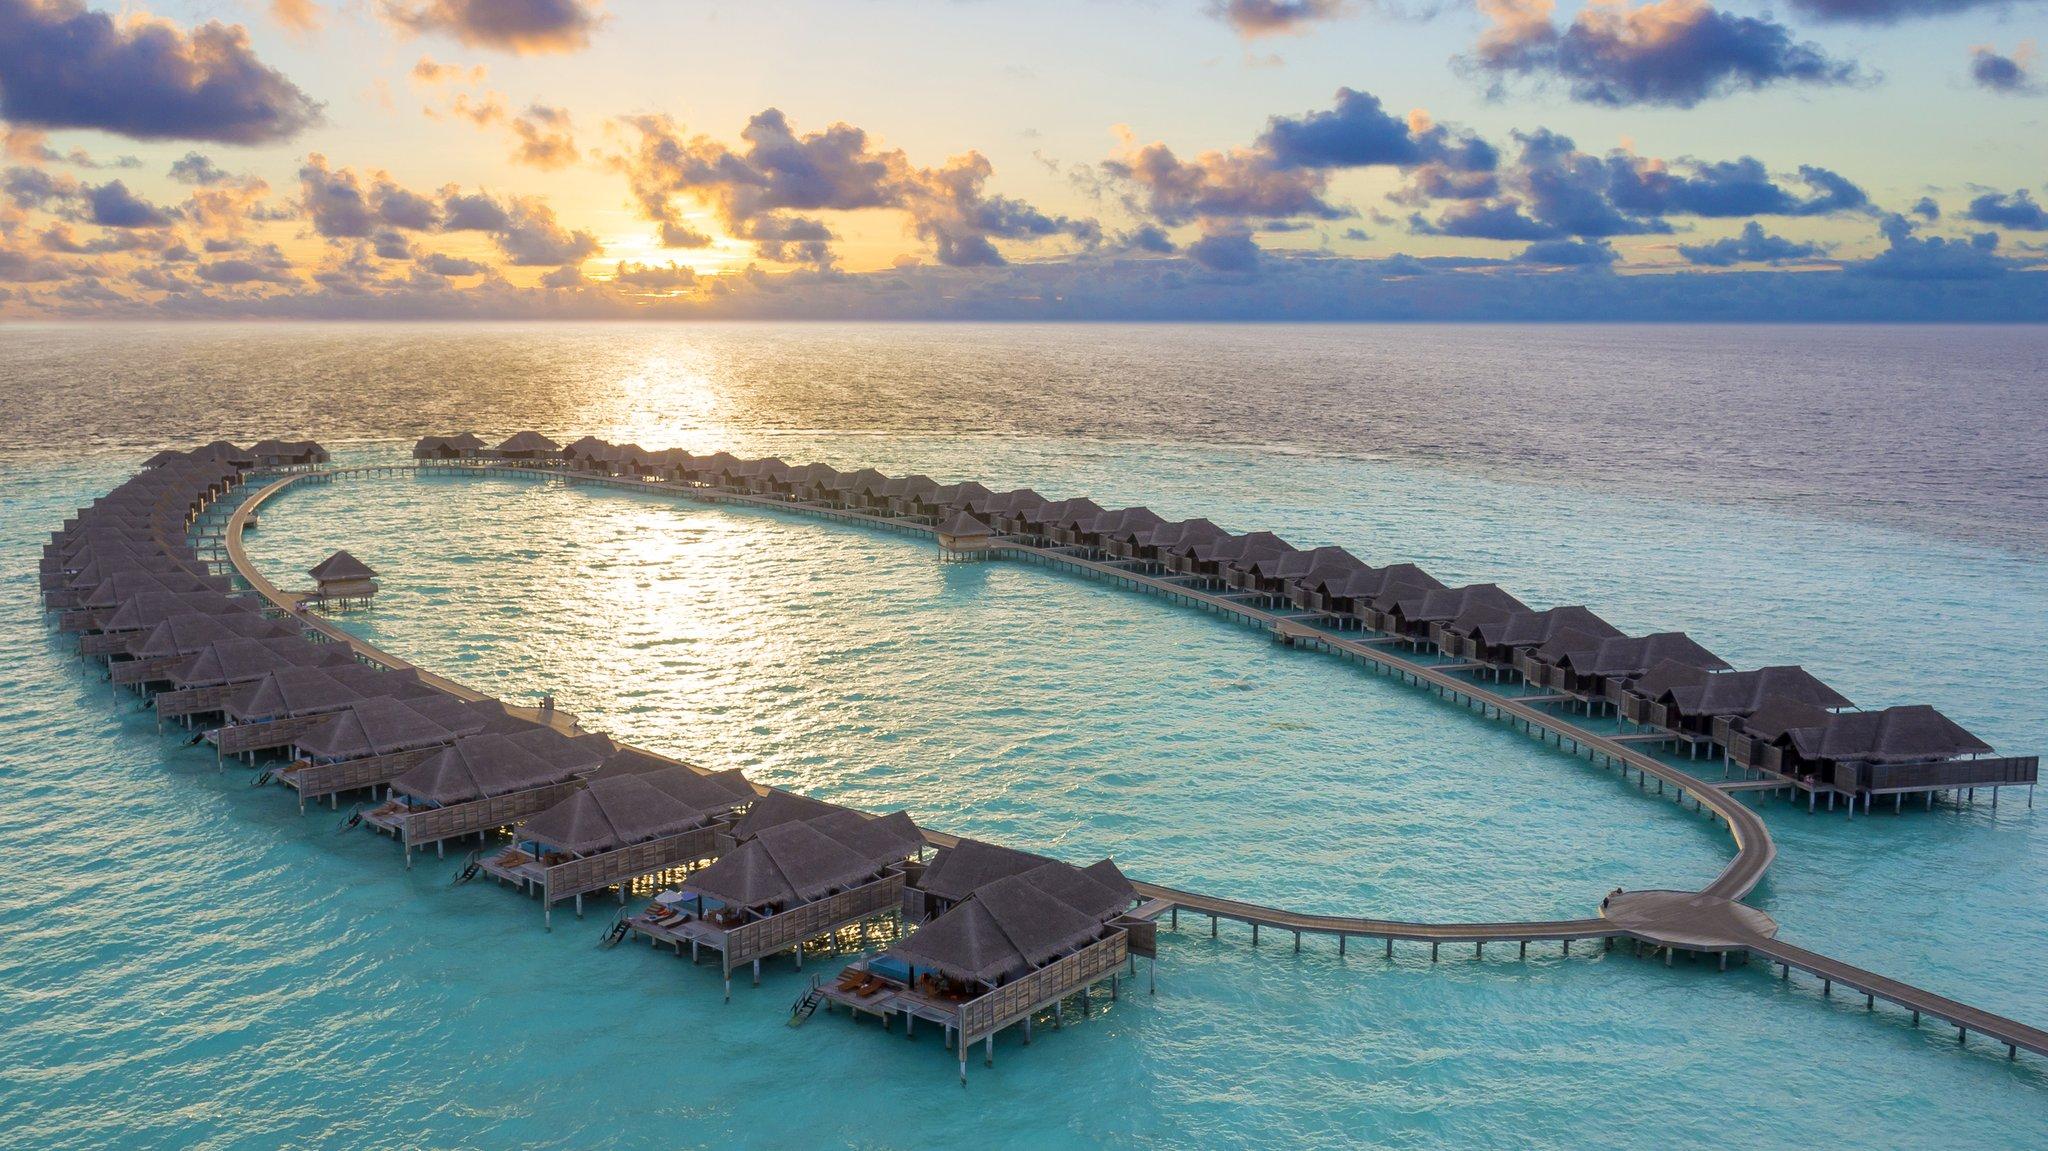 Maldives Anantara Kihavah 17 Overwater villas Sunset_aeria